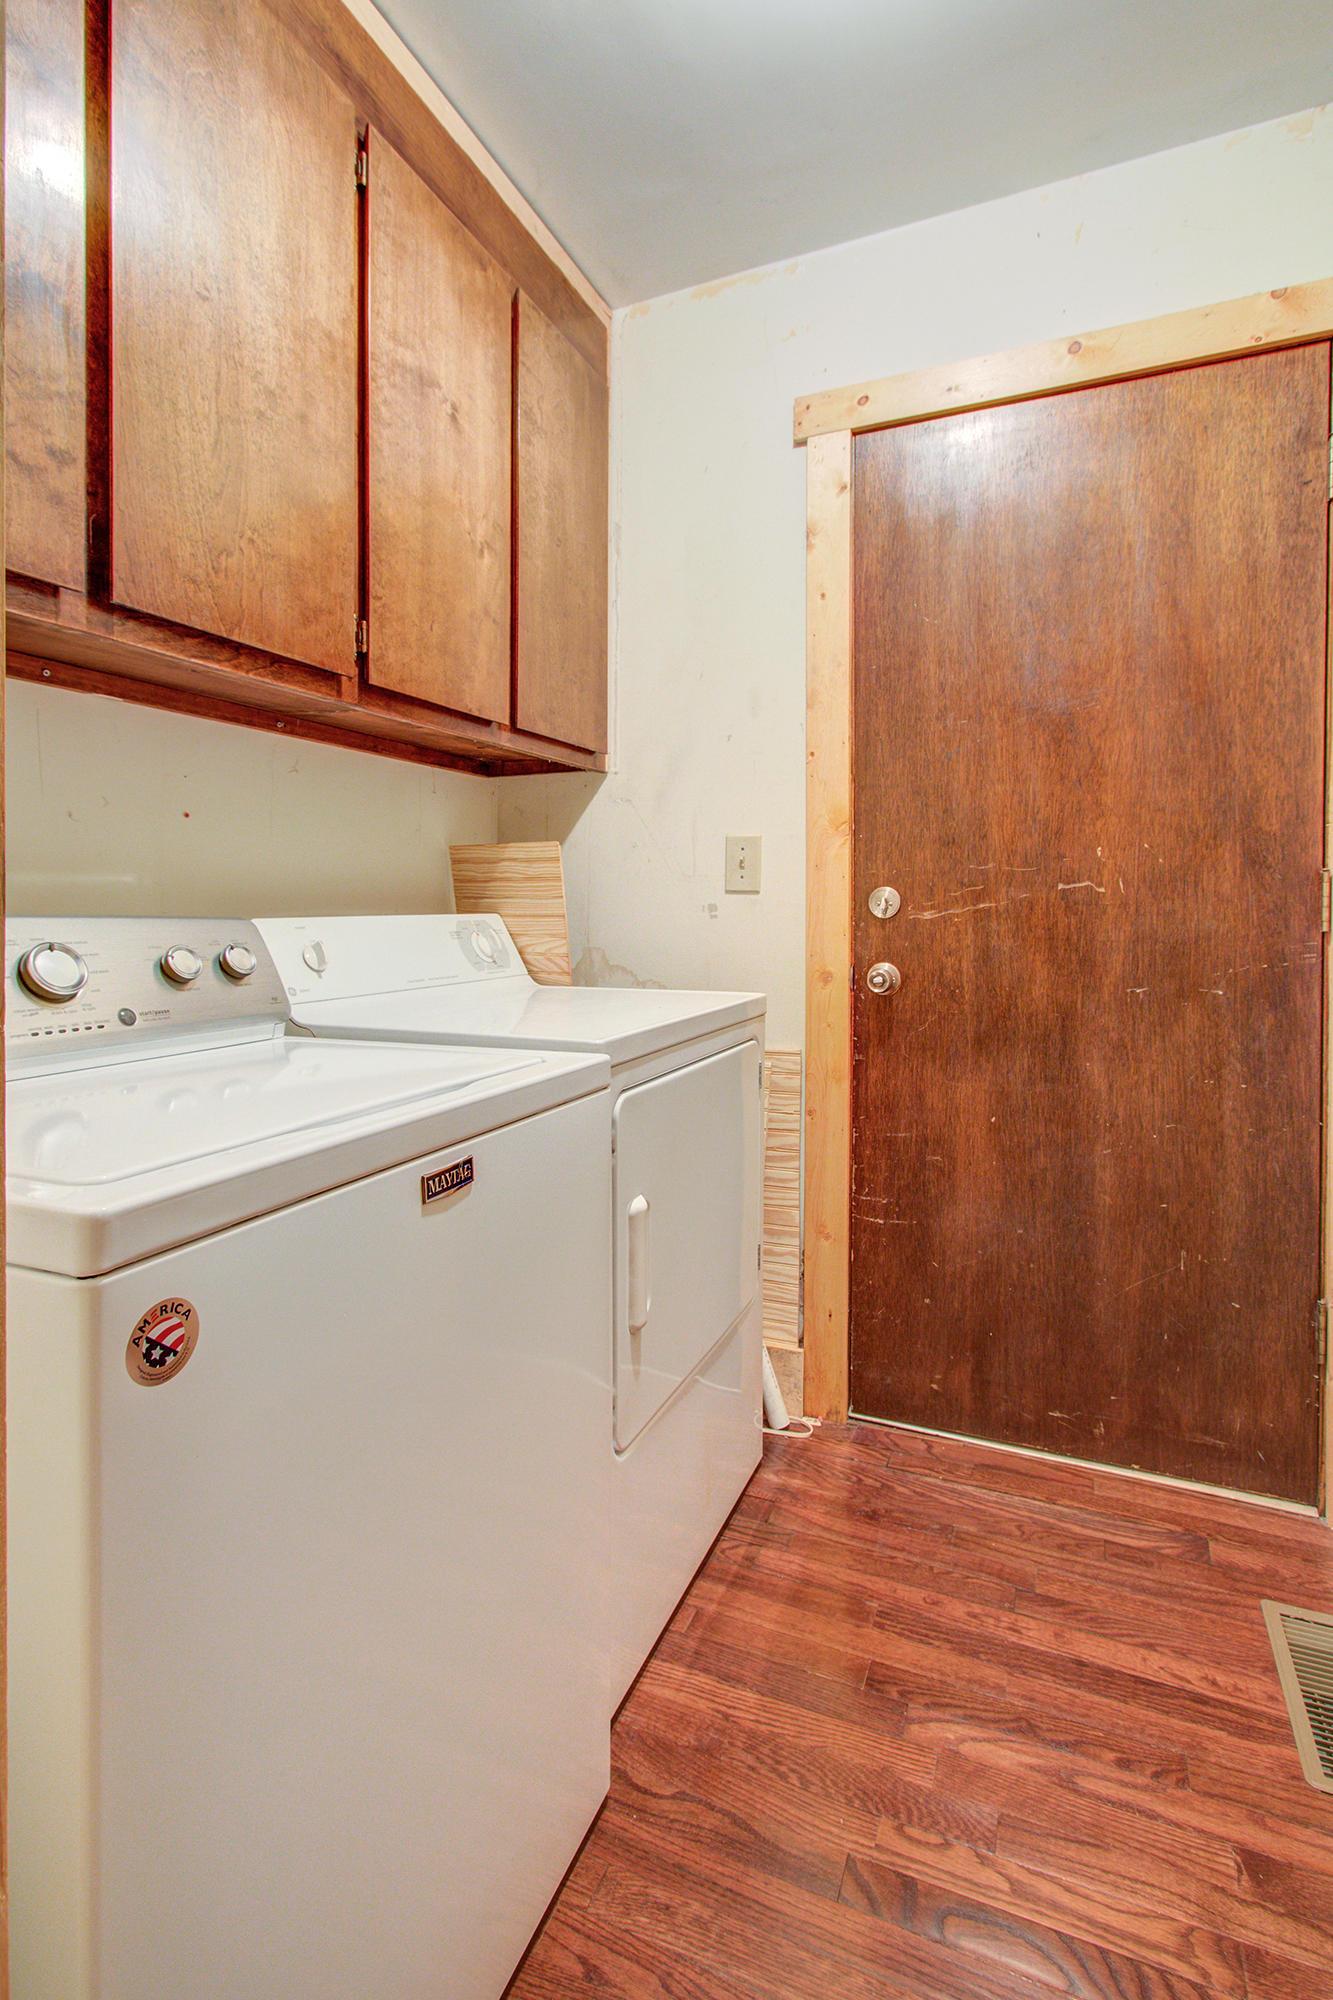 Wando Lakes Homes For Sale - 858 Fairlawn, Mount Pleasant, SC - 24